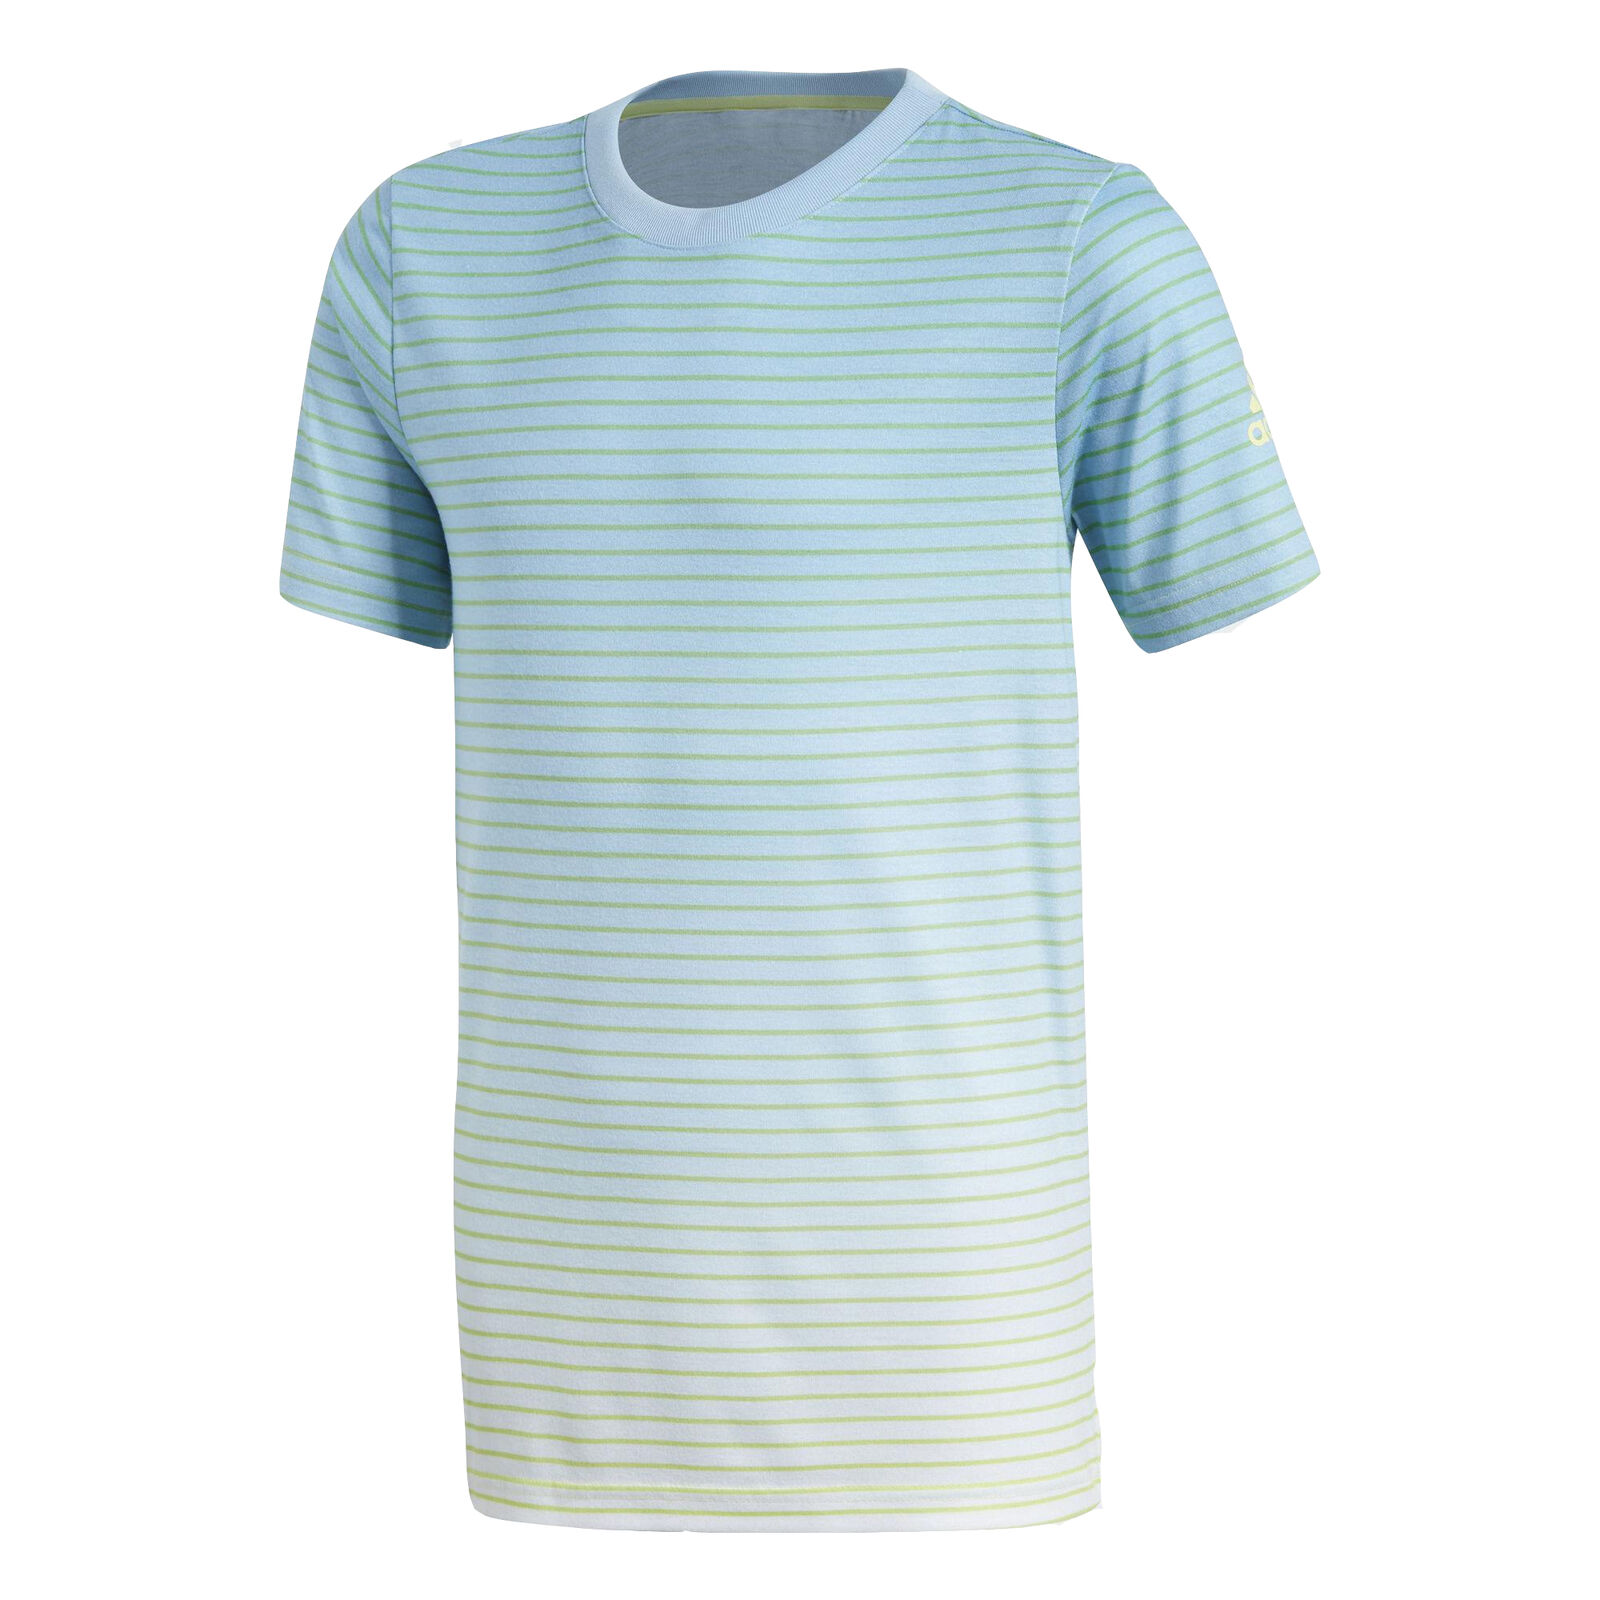 Adidas Boys Melbourne Crew Breathable Lightweight Tennis T-Shirt